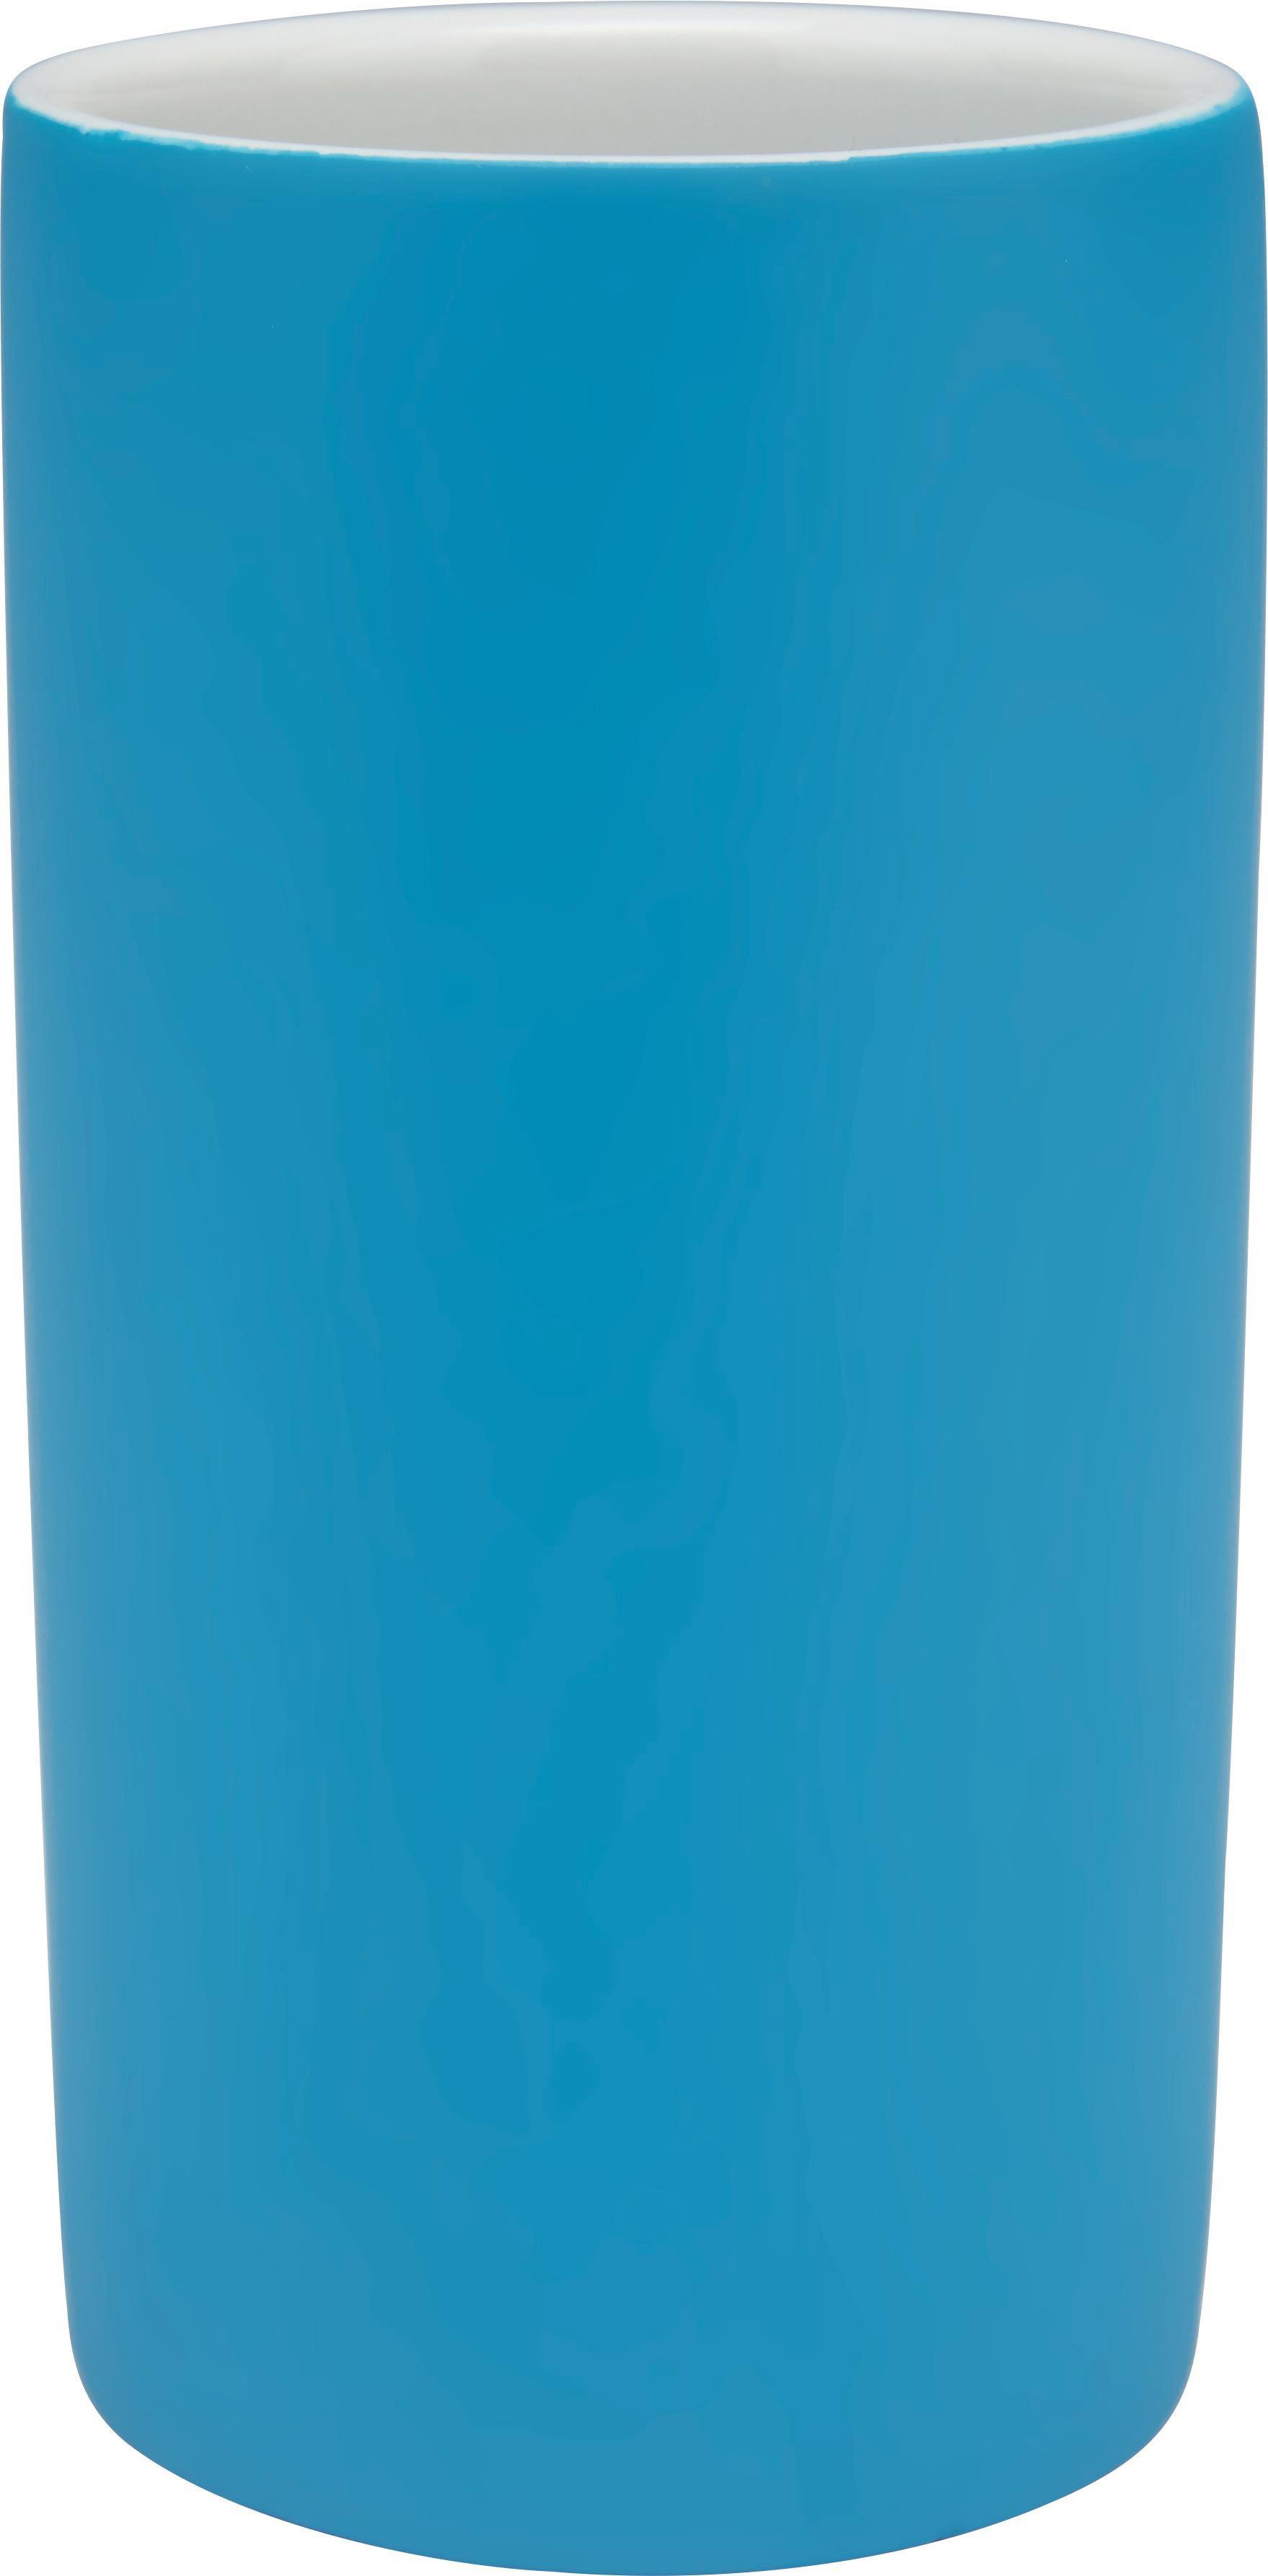 Zahnputzbecher Melanie in Petrol aus Keramik - Petrol, KONVENTIONELL, Keramik (6,5/12cm) - MÖMAX modern living